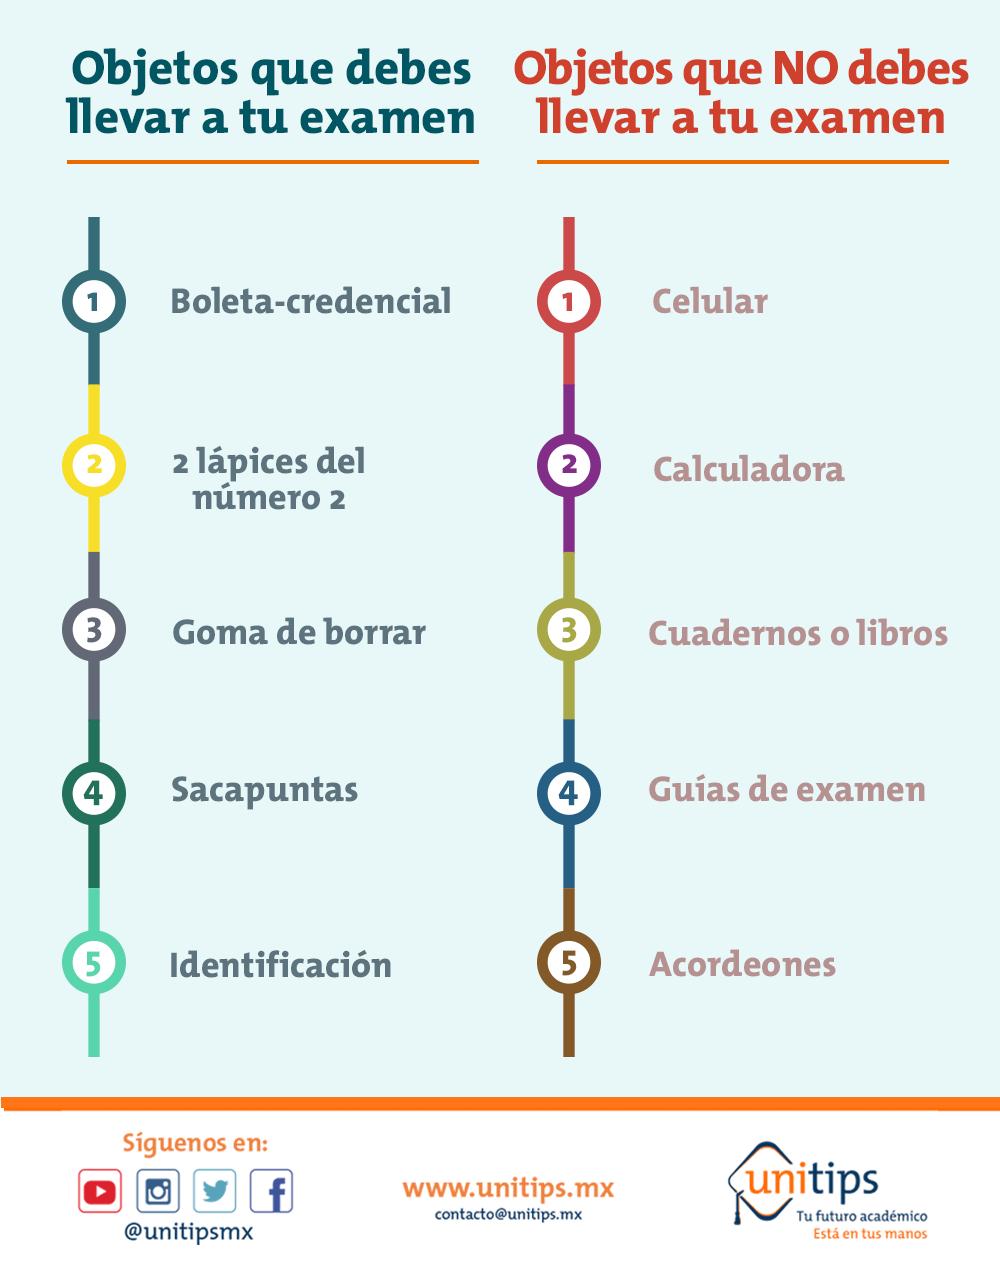 Infografía-Objetos-Examen-1.png